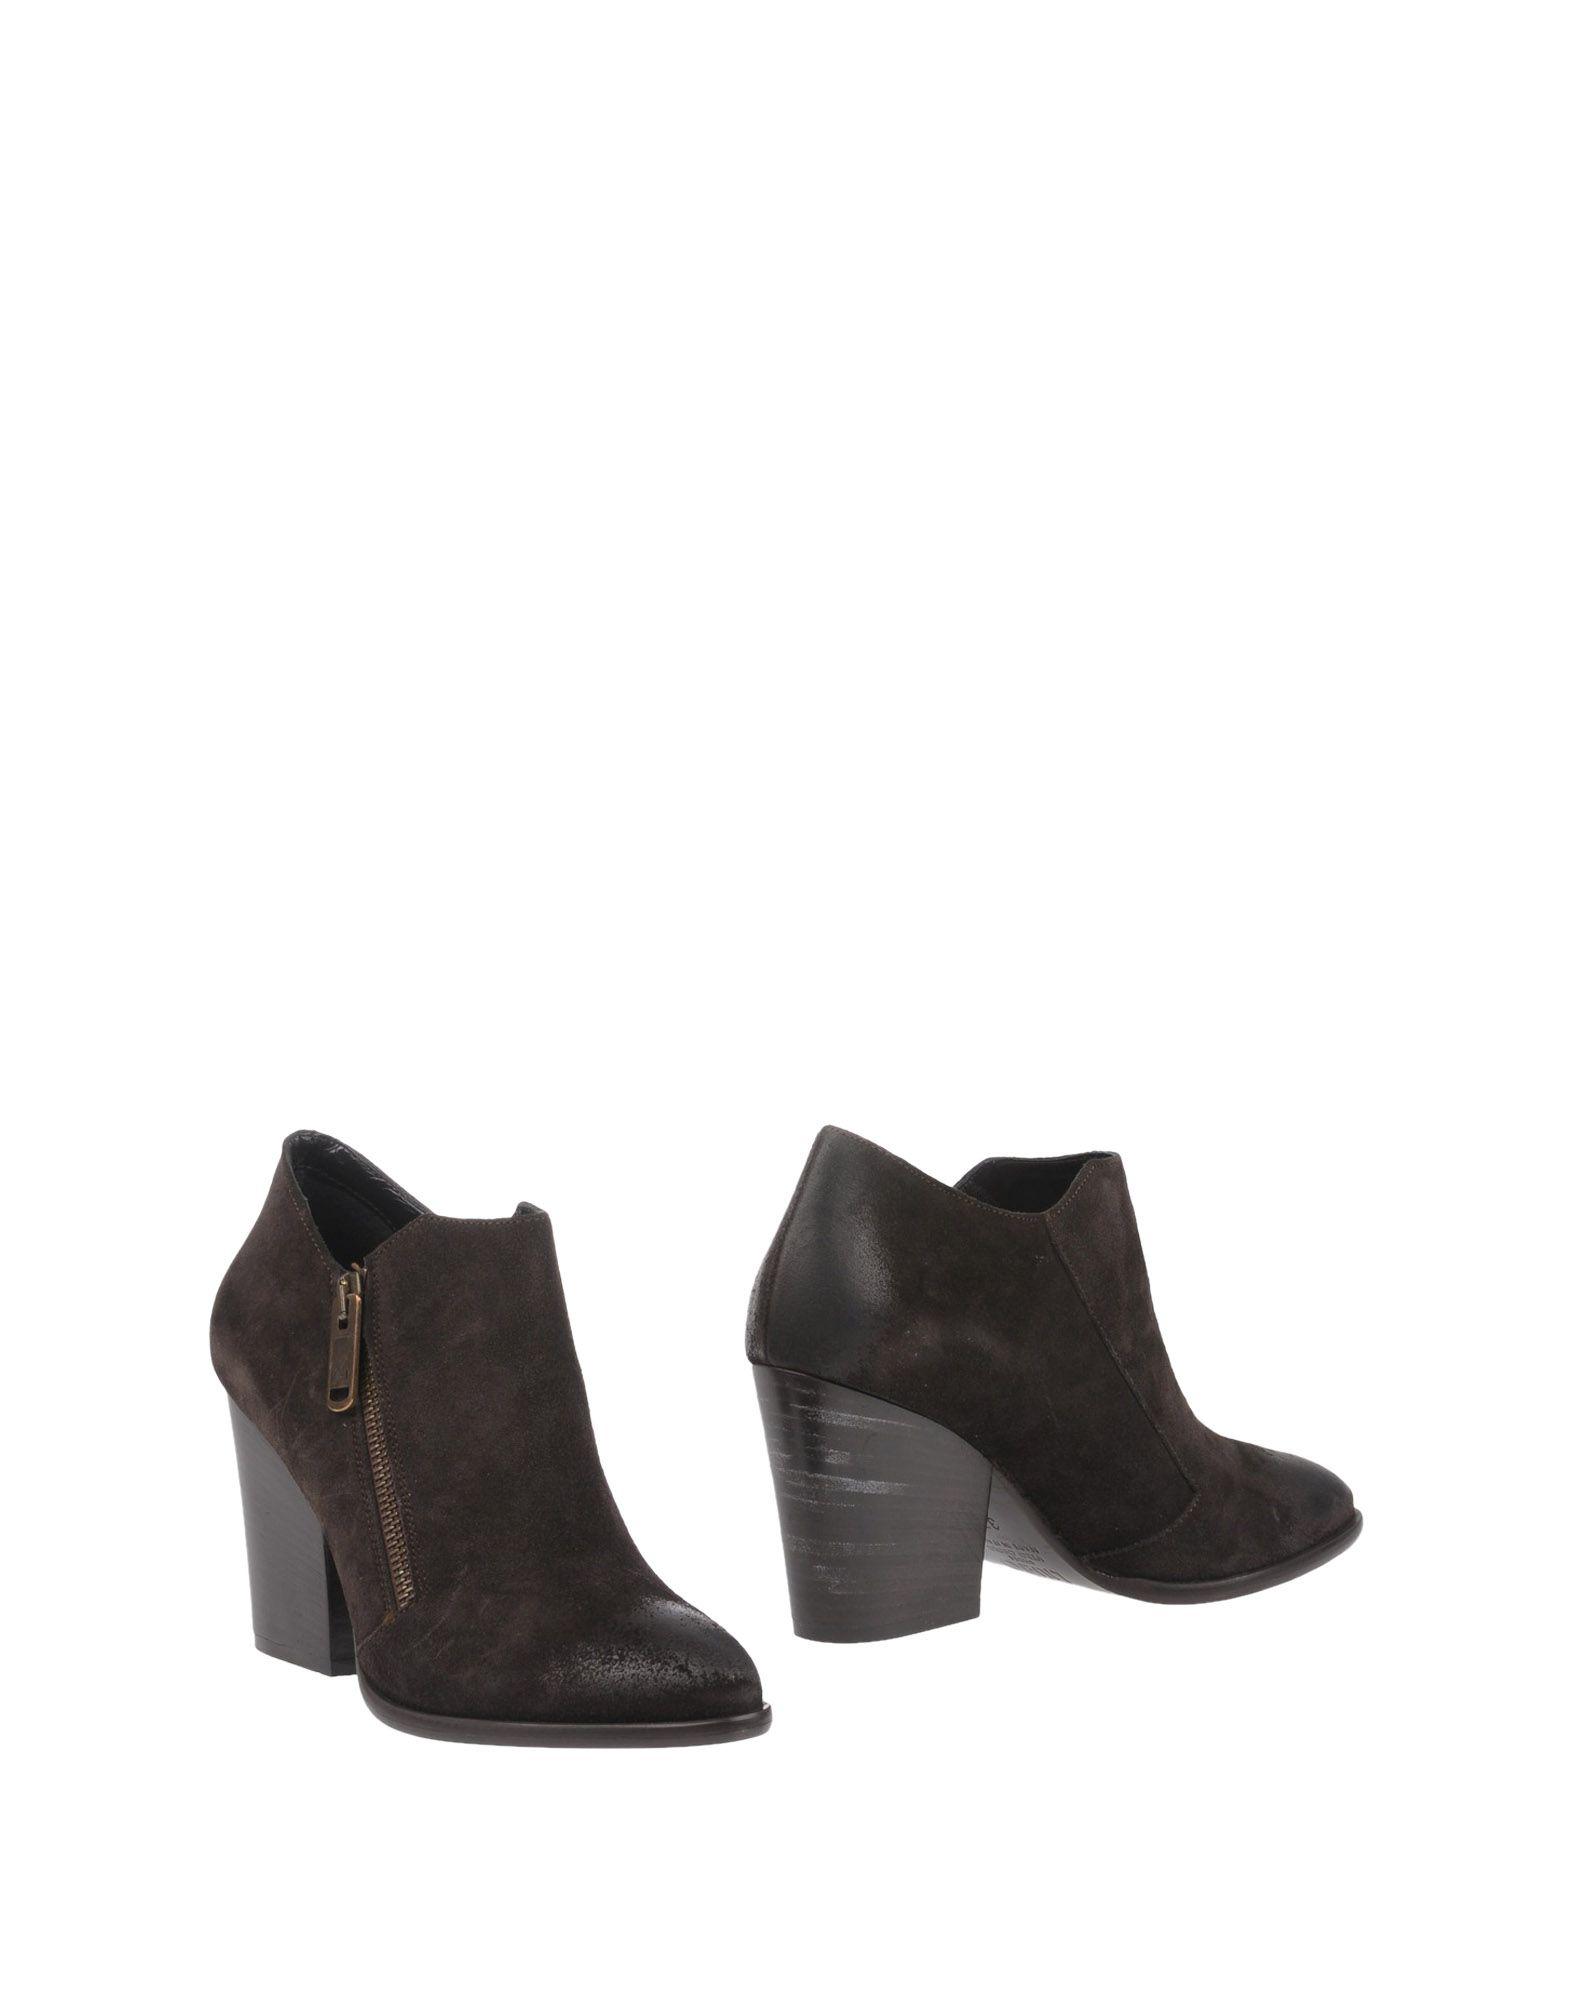 Liu •Jo Shoes Stiefelette Damen  11211987MT Gute Qualität beliebte Schuhe